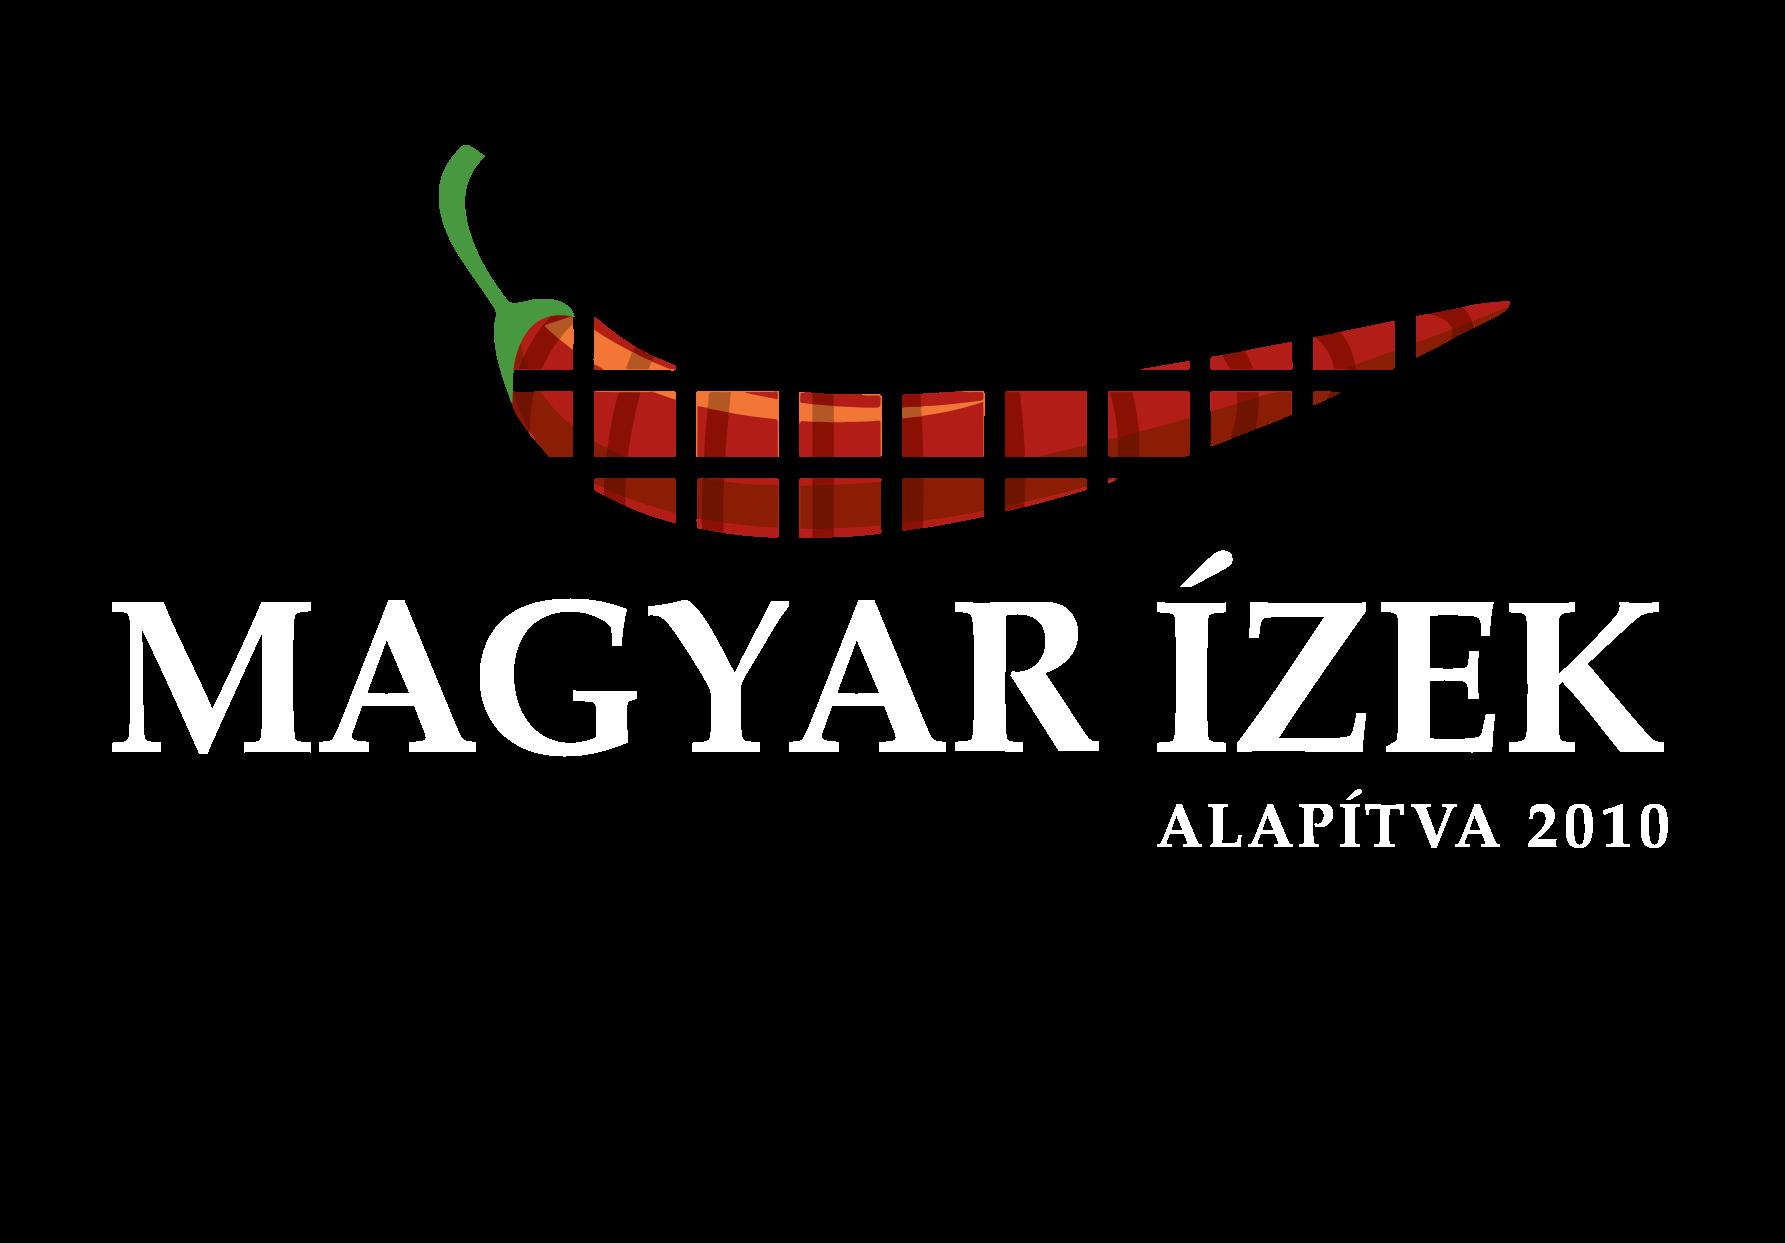 Magyar Ízek